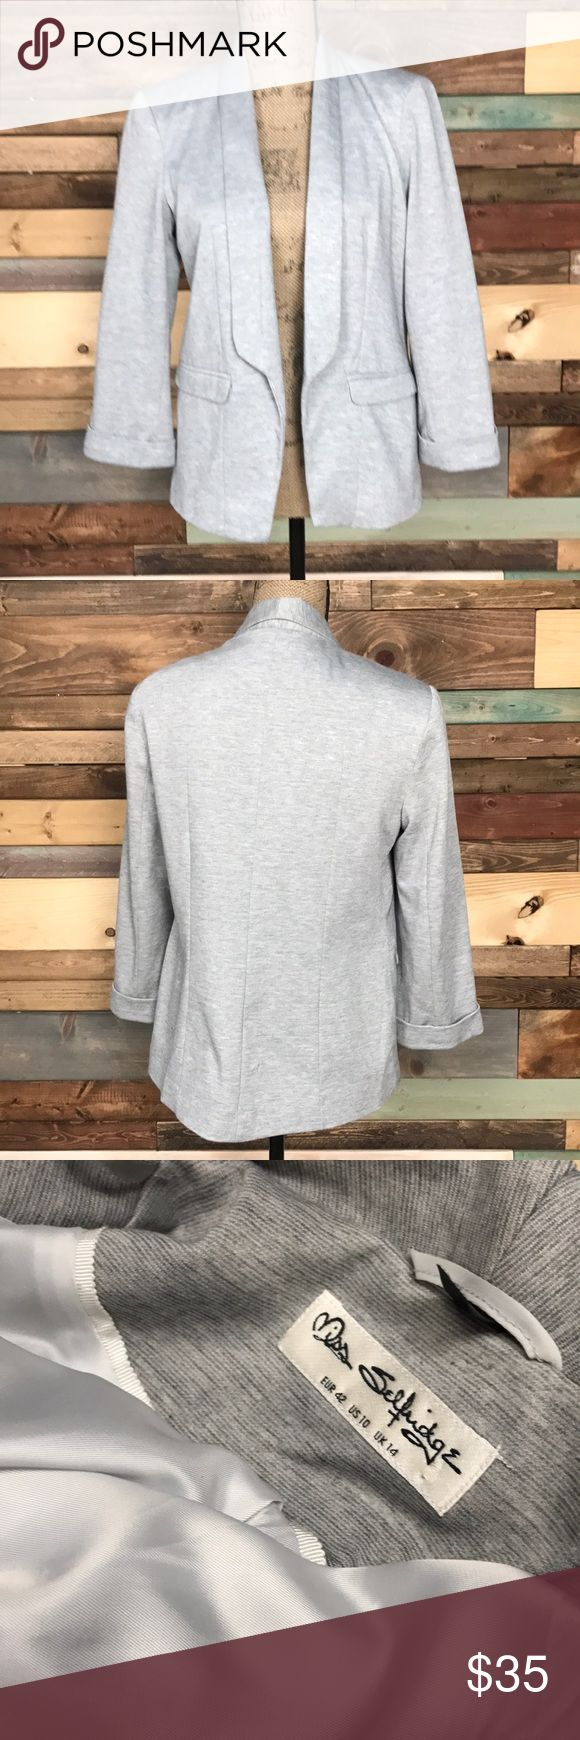 "Miss Selfridge Grey Knit Ponte Blazer Jacket 10 Miss Selfridge Grey Knit Ponte Blazer Jacket 10  // Bust: 20"" laying flat // Length: 24"" Bundle your likes and make an offer for best deals @woodsnap! Miss Selfridge Jackets & Coats Blazers"